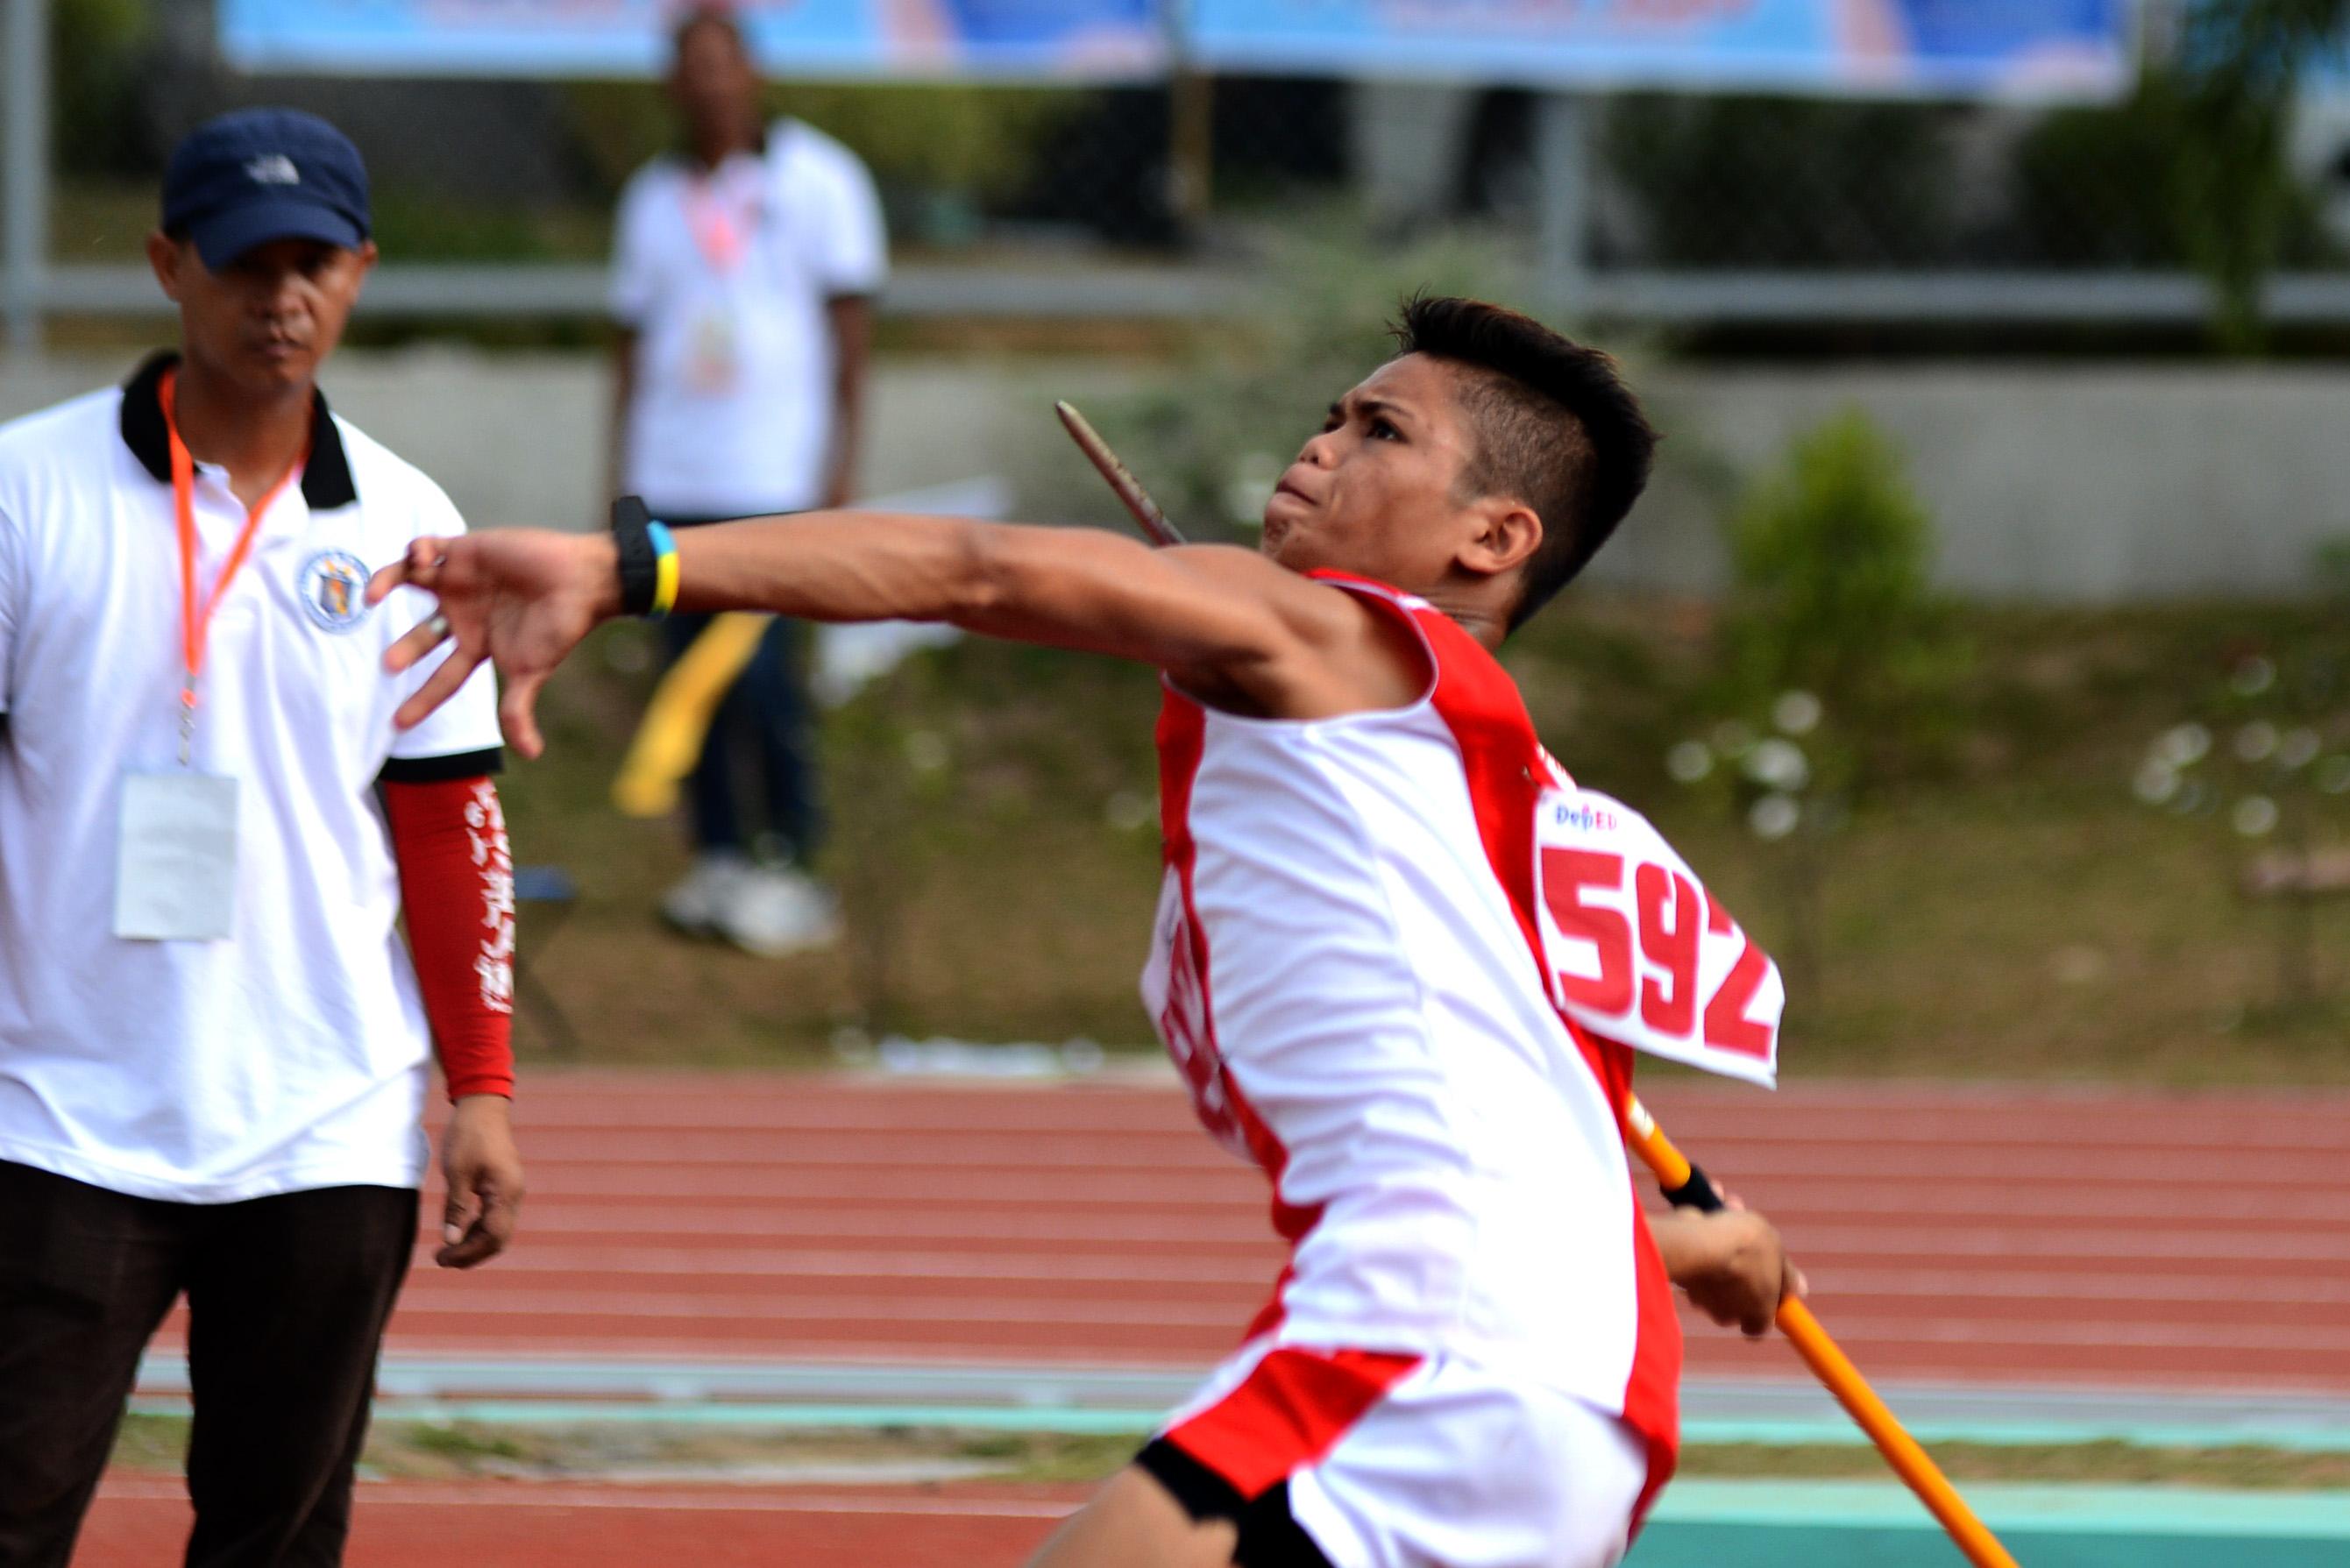 RECORD BREAKER. Calabarzon's Jerick Mendoza, 13, of Balibago Elementary School smashes the elementary boys javelin throw record with a 57.50-meter distance. Photo by Roy Secretario/Rappler